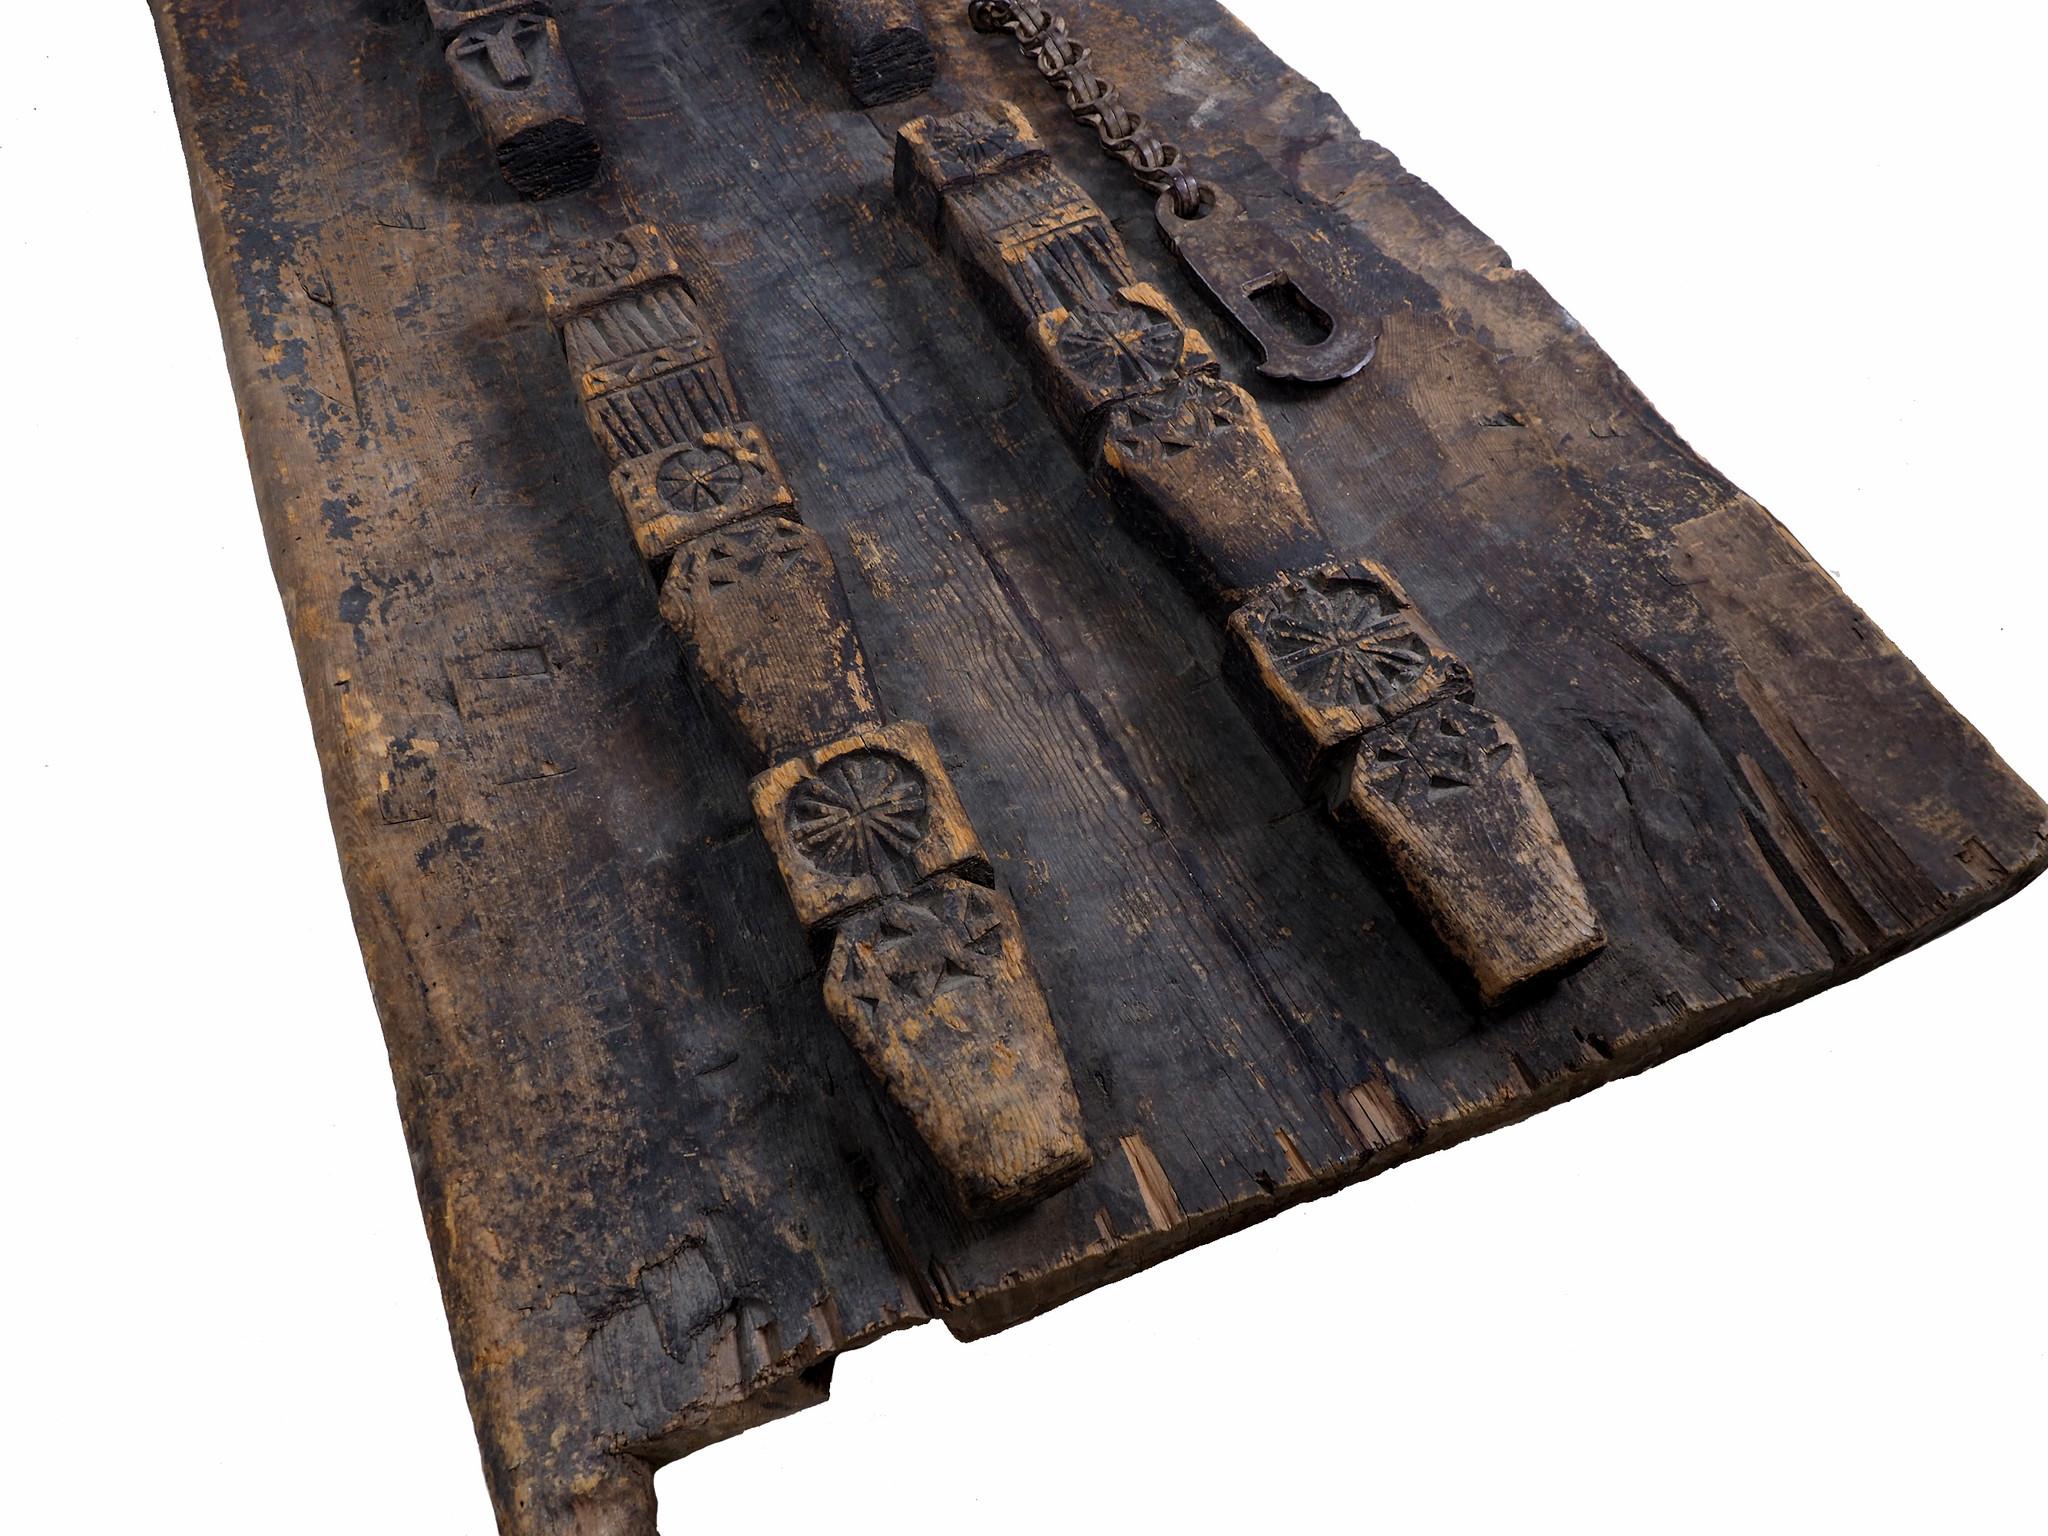 antik orient Massiv Holz Haustür Tür türplatte zimmertür Afghanistan Nuristan Pakistan Swat-Valley 19 Jh. Nr:19/A1